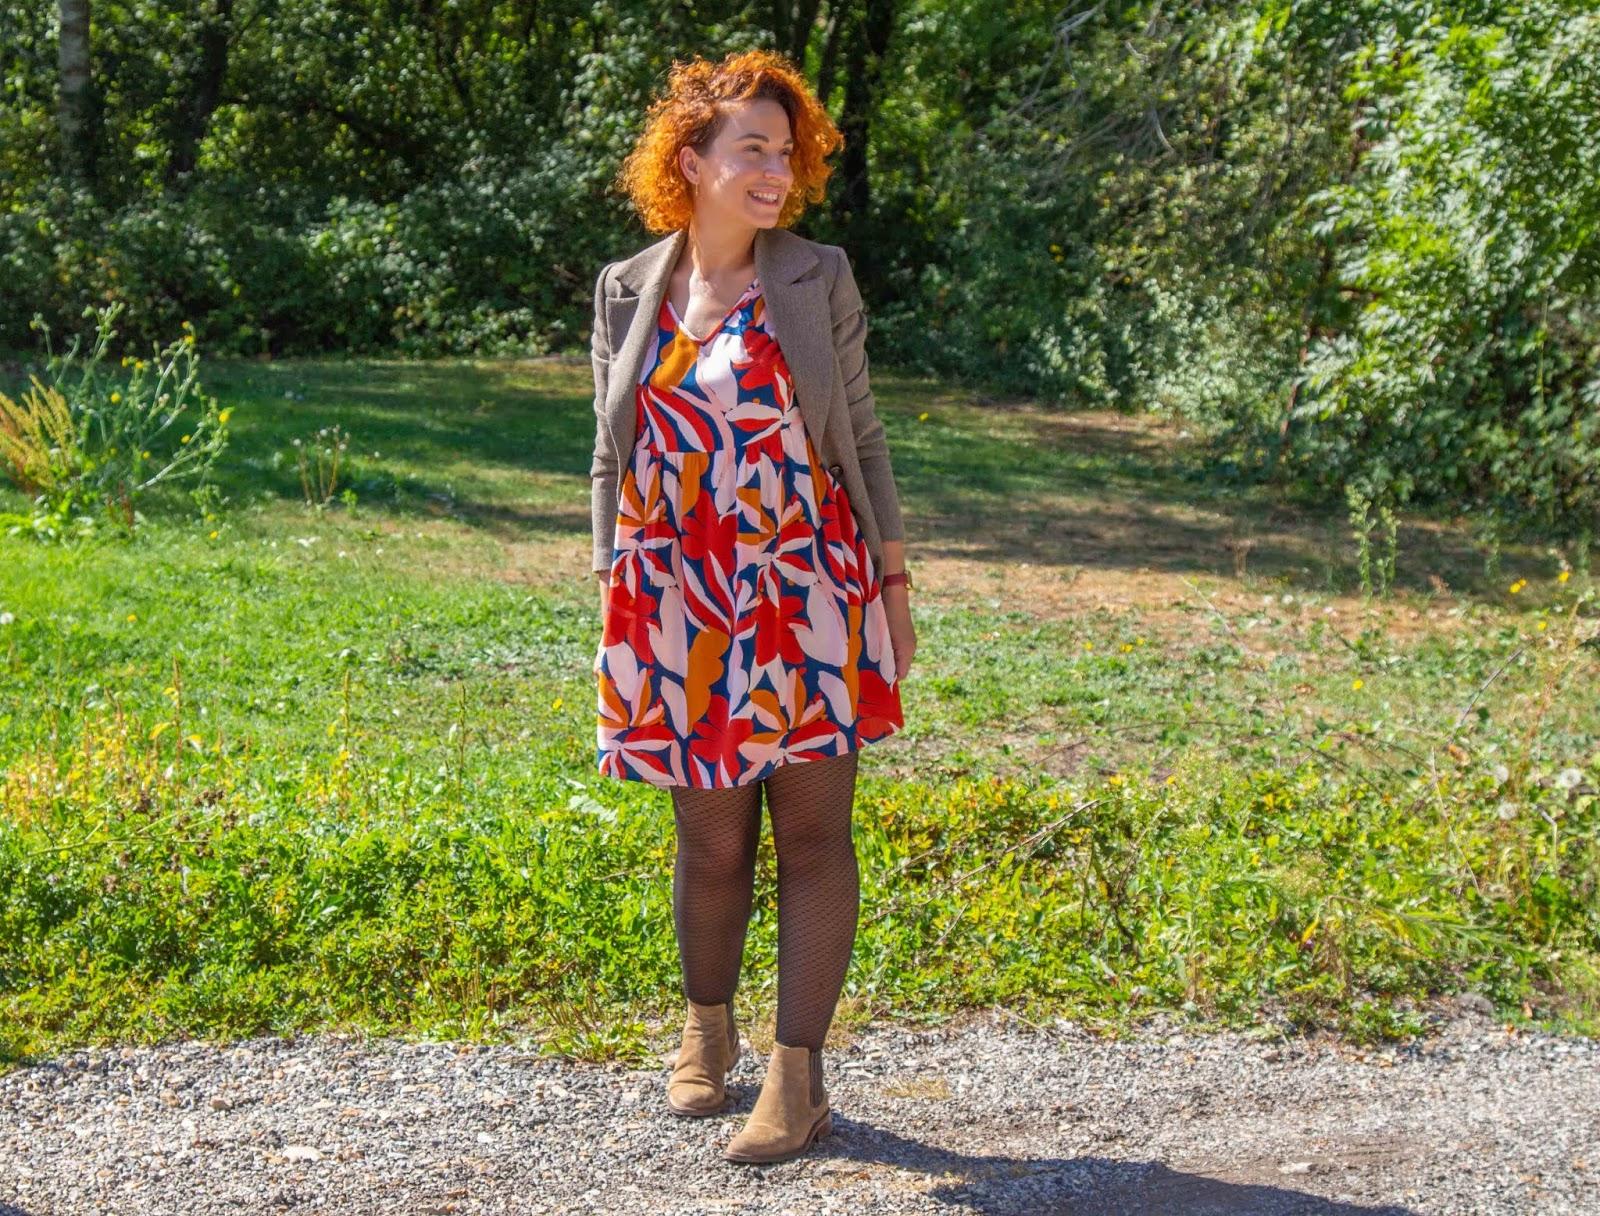 porter-sa-robe-d-ete-en-automne